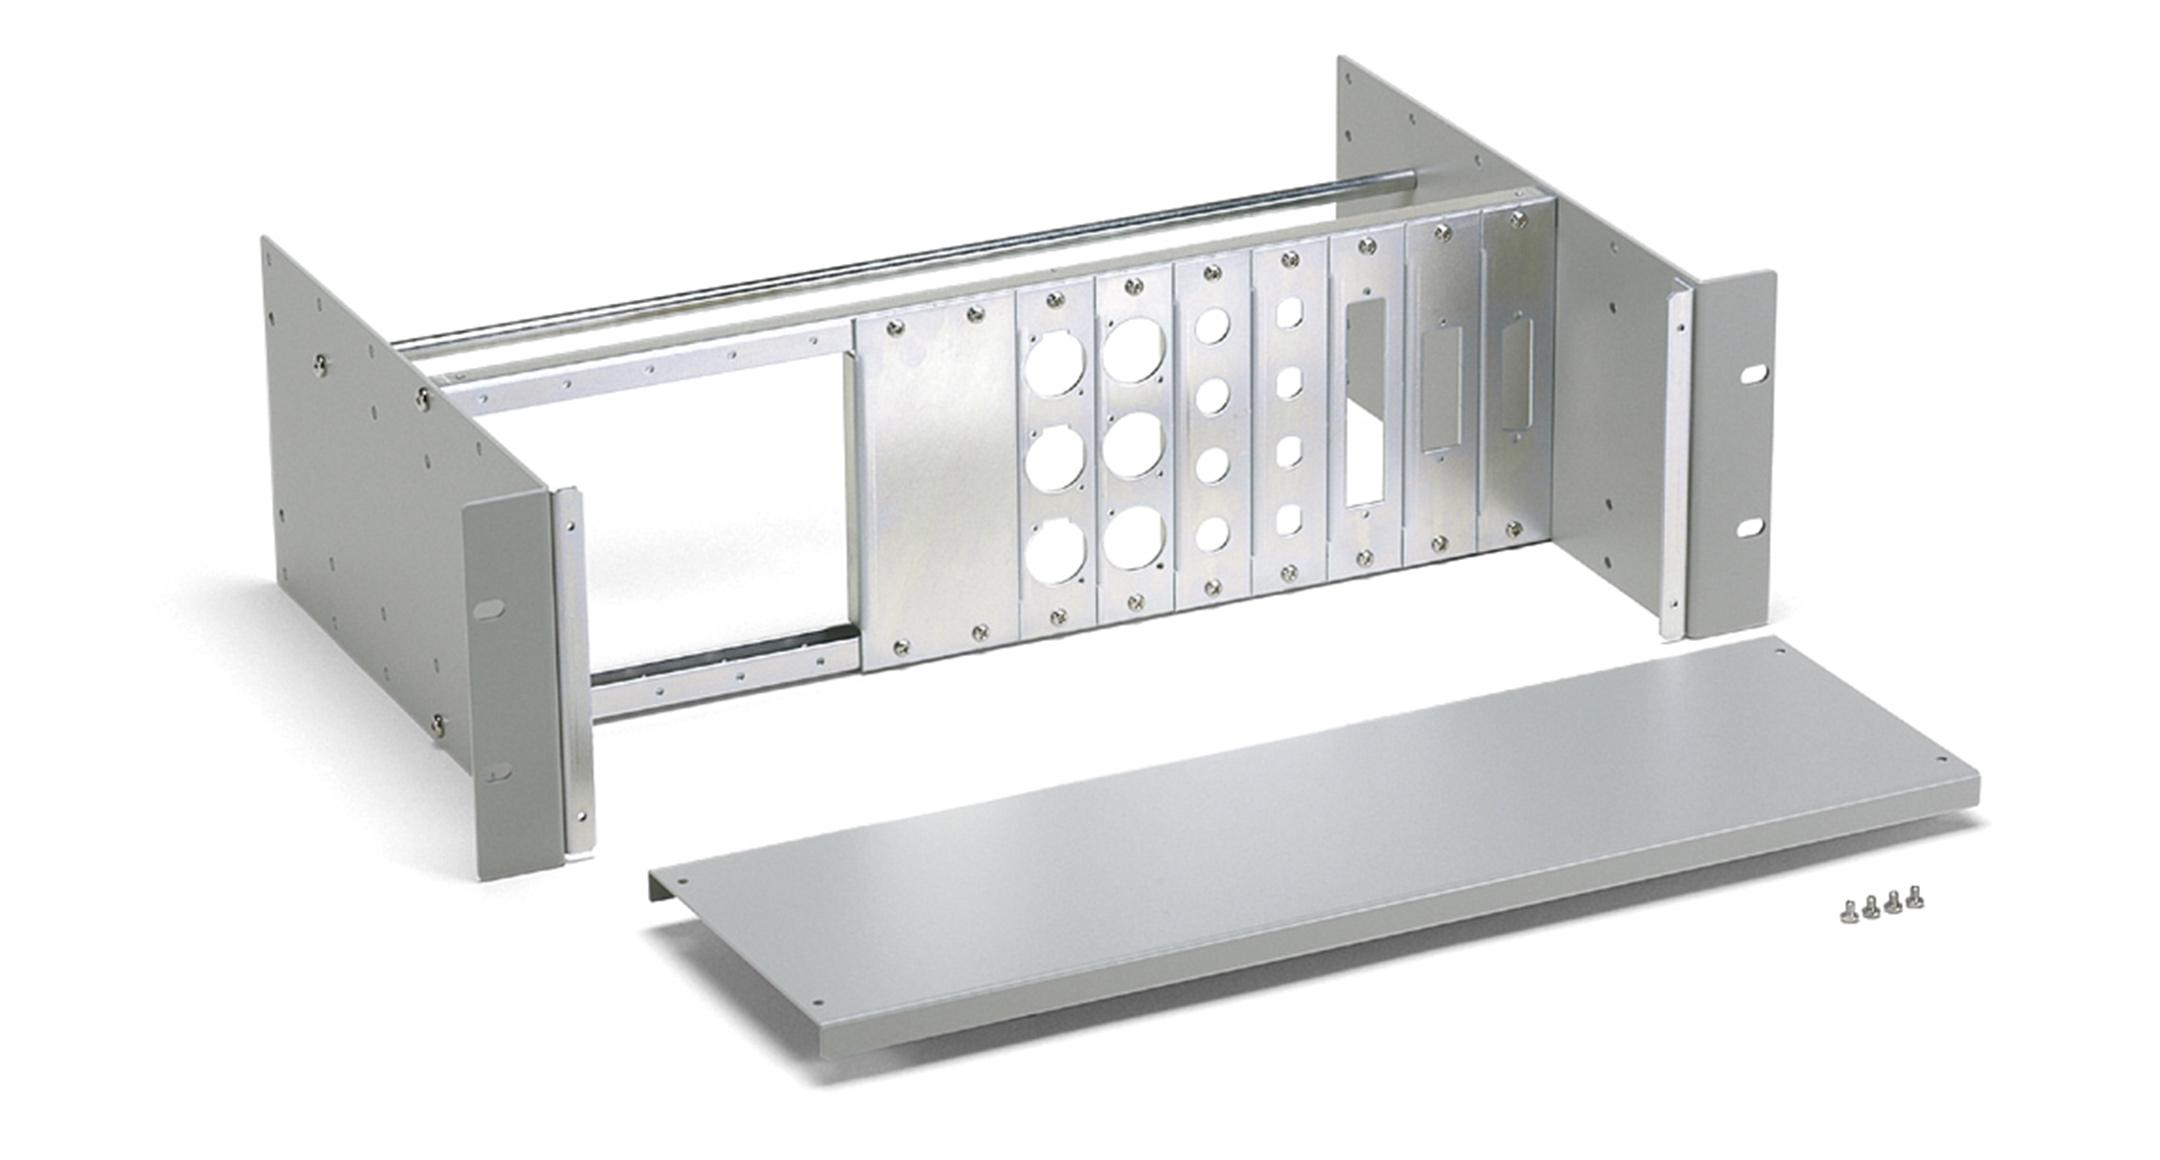 EIAラック端子盤ユニット UTシリーズの画像